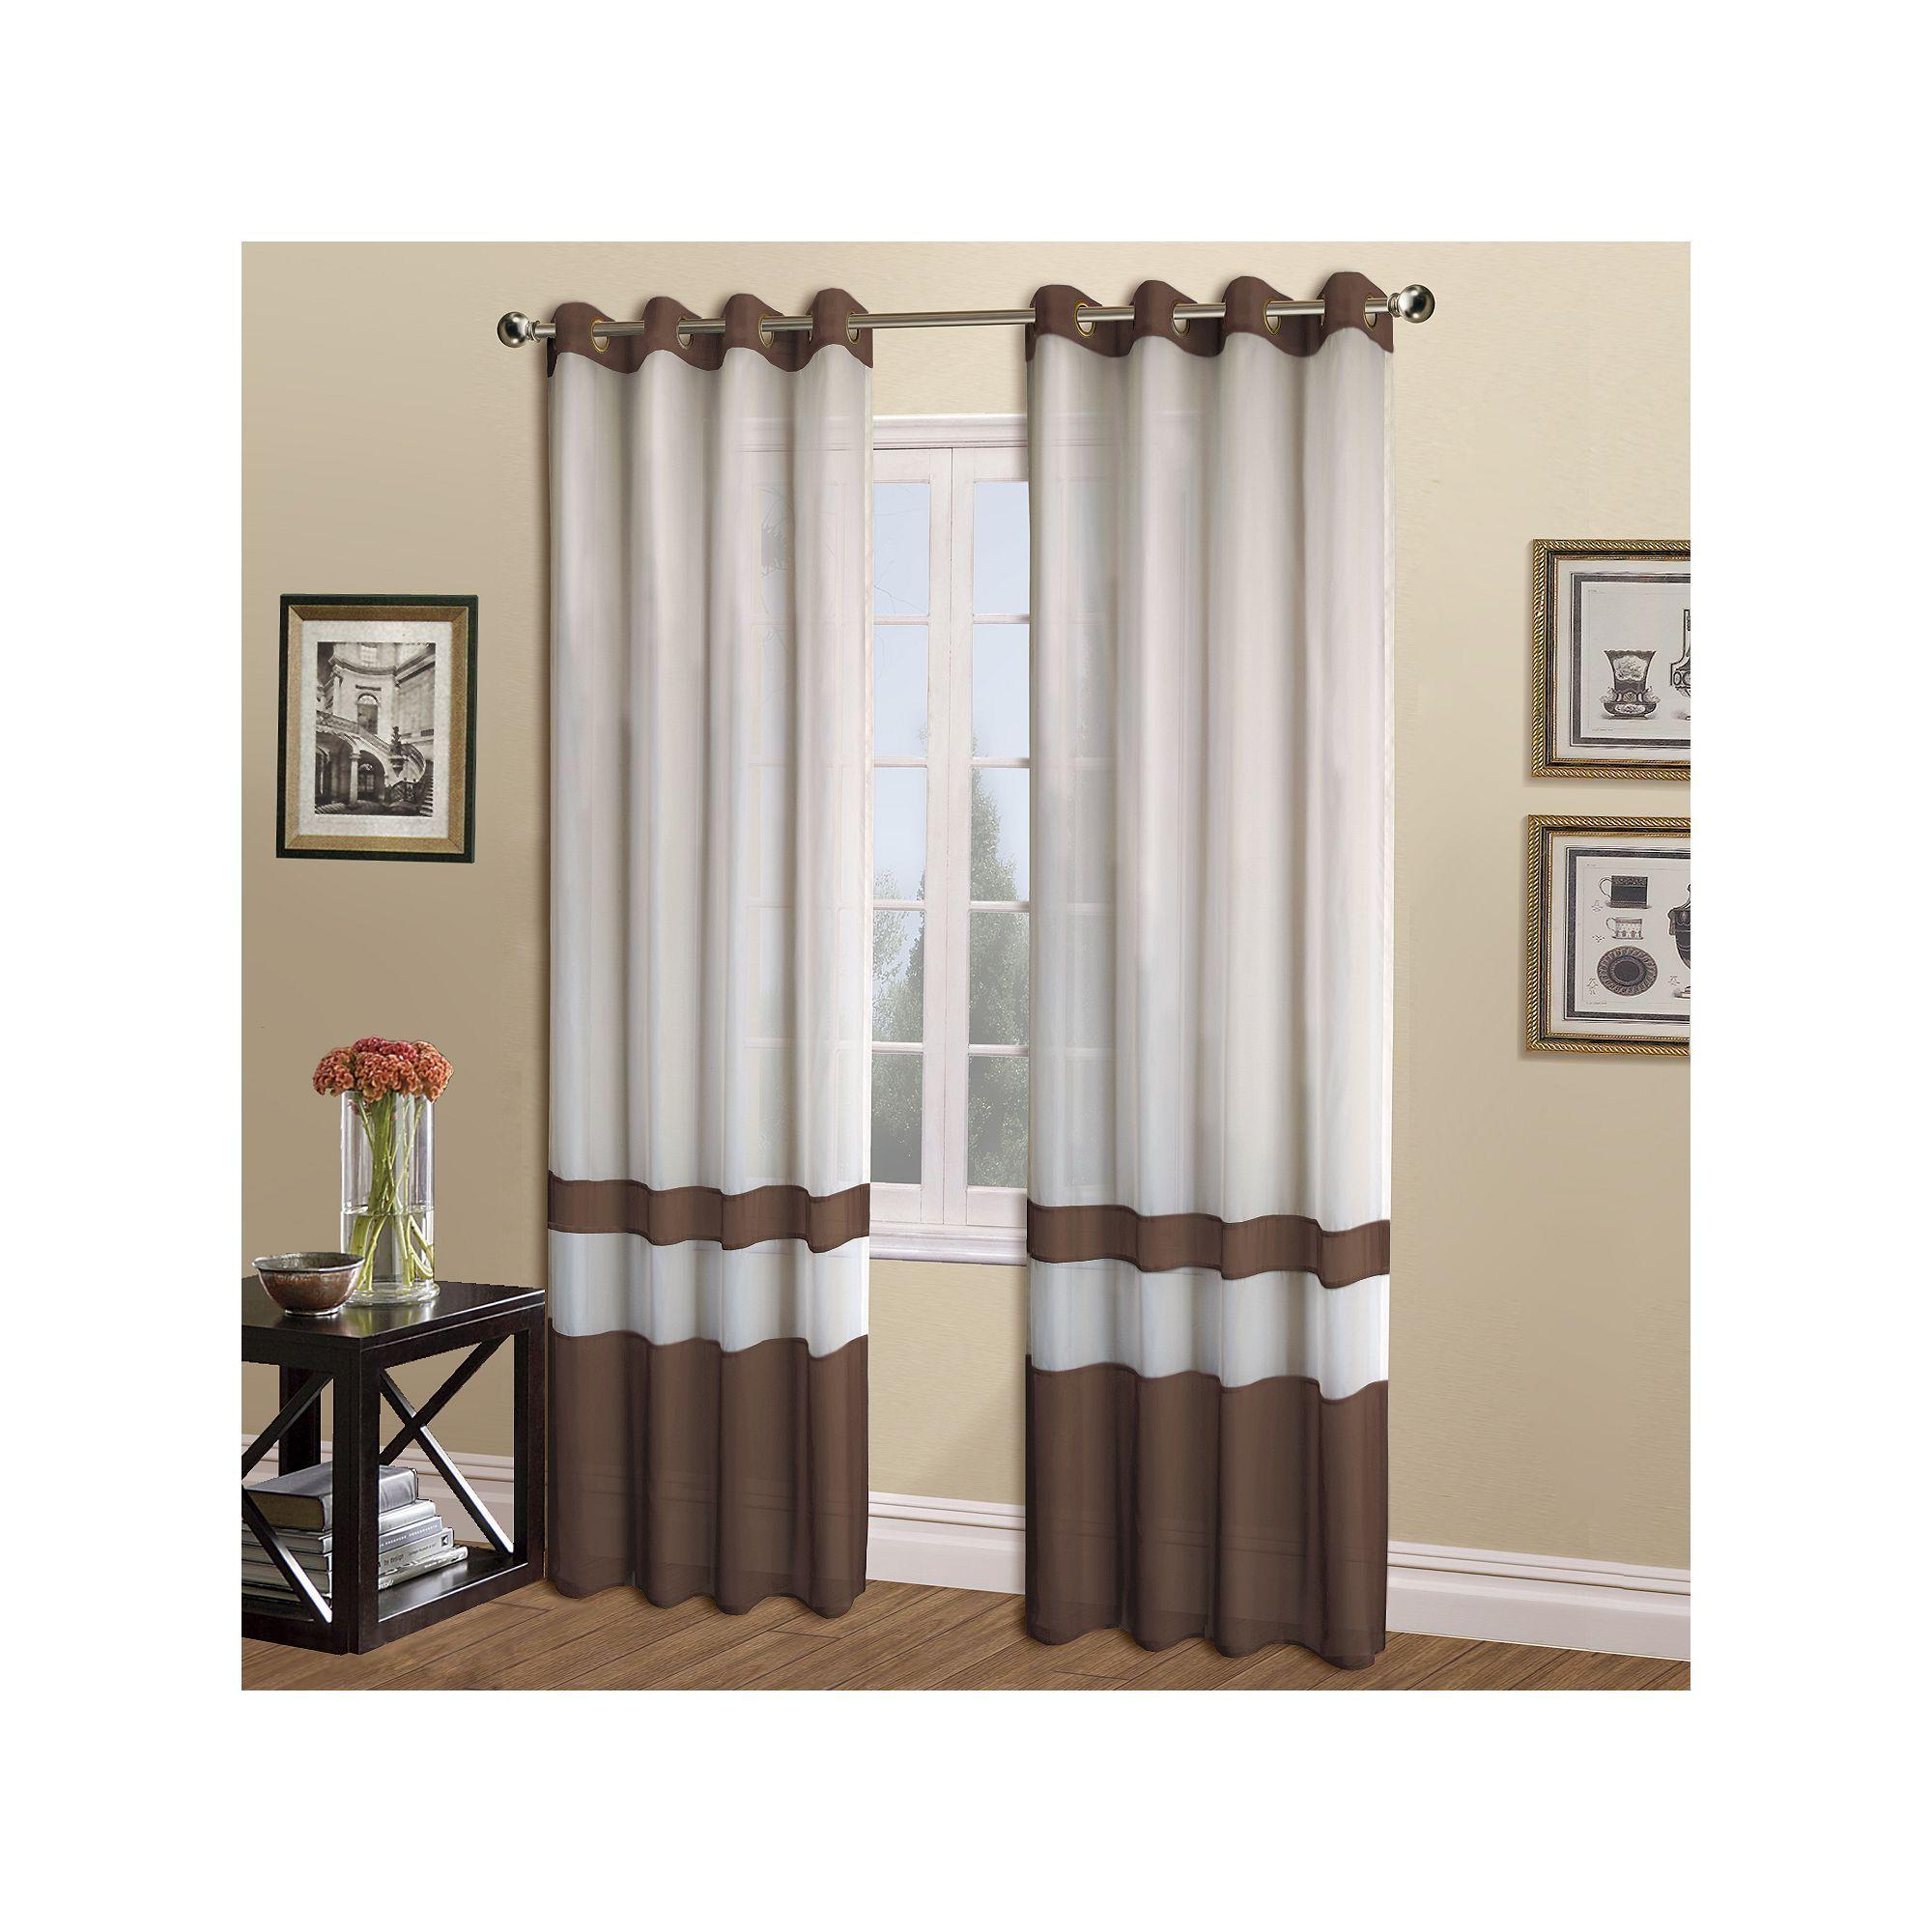 United Window Curtain Co. Milan Window Curtain, Black | Window ...